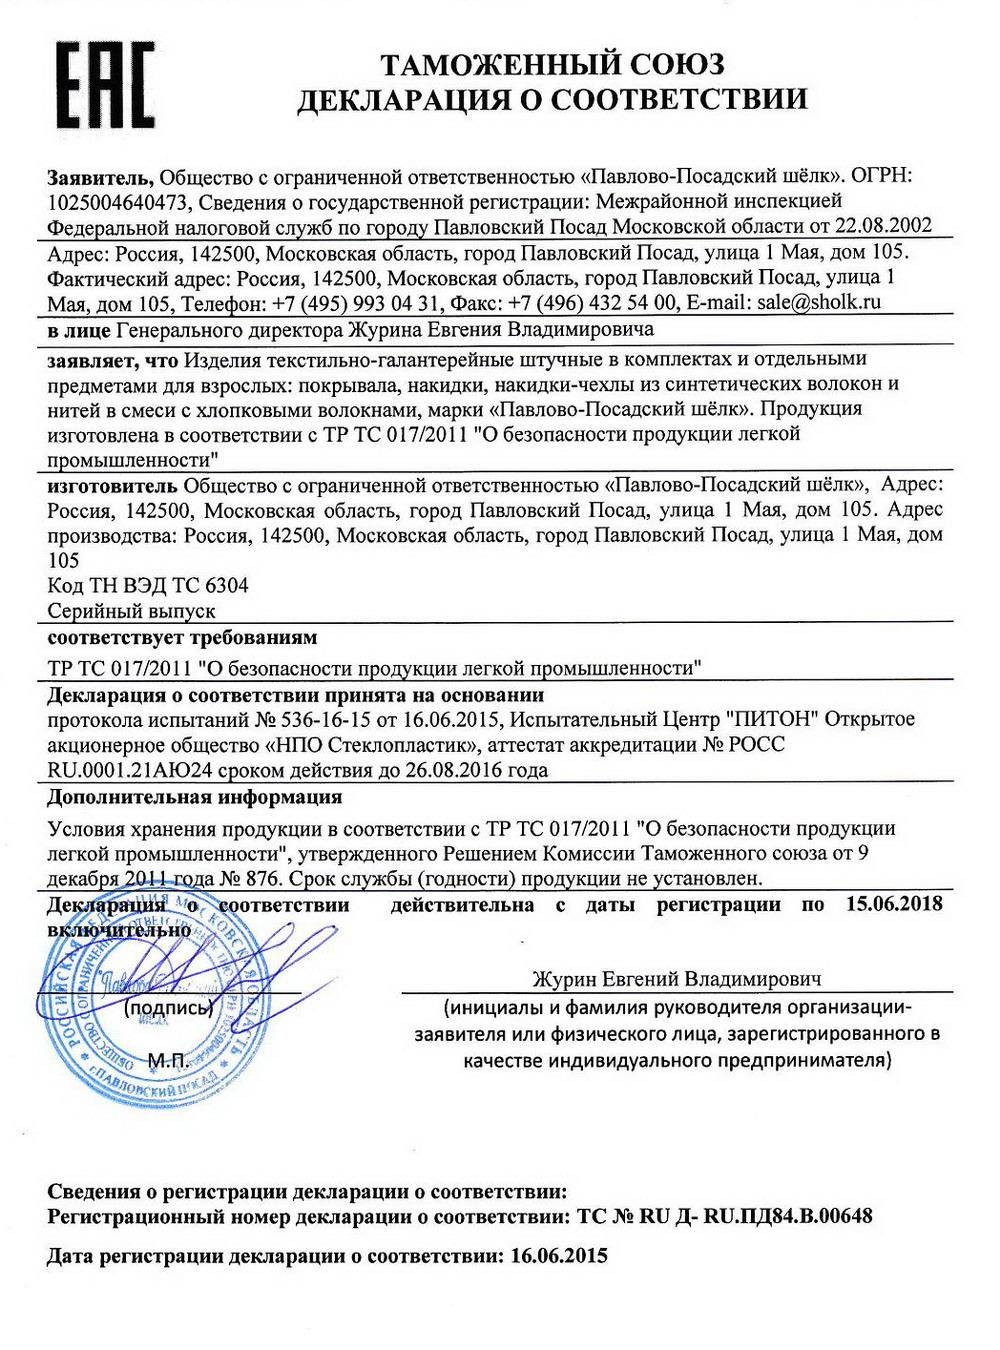 Таможенная декларация на покрывала Павлов Посад